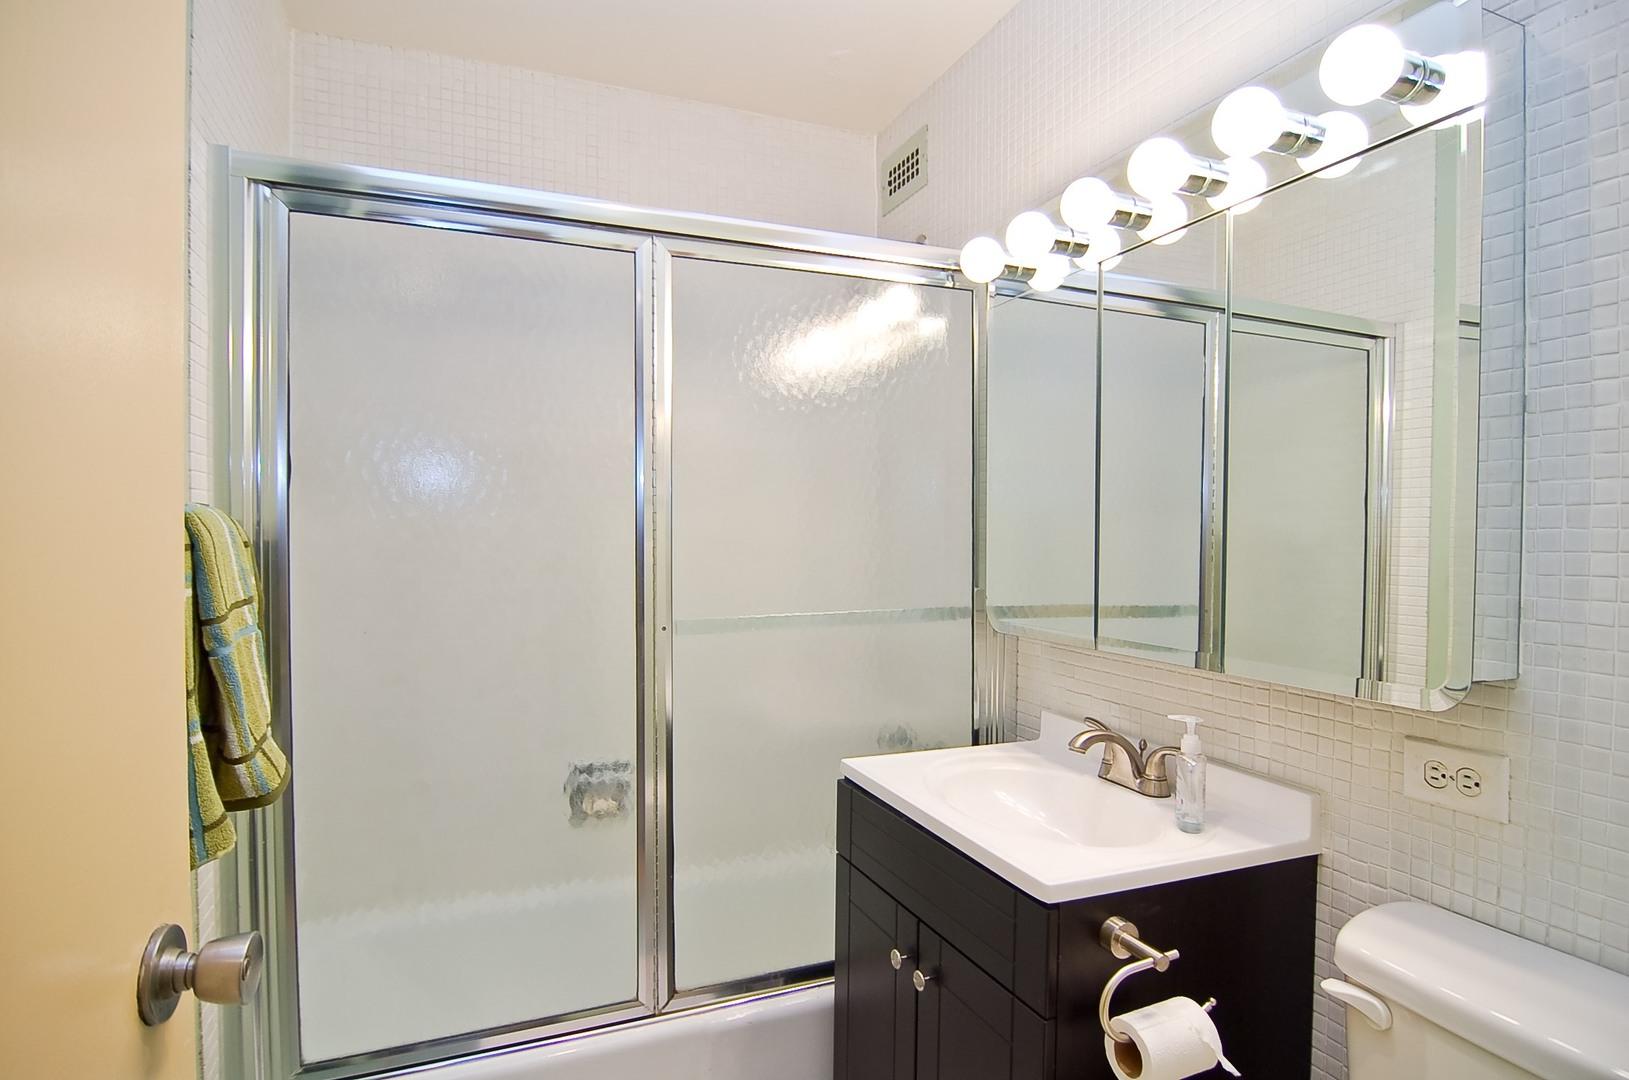 Hd 1497289674202 10 2626nlakeview unit301 8 bathroom hires